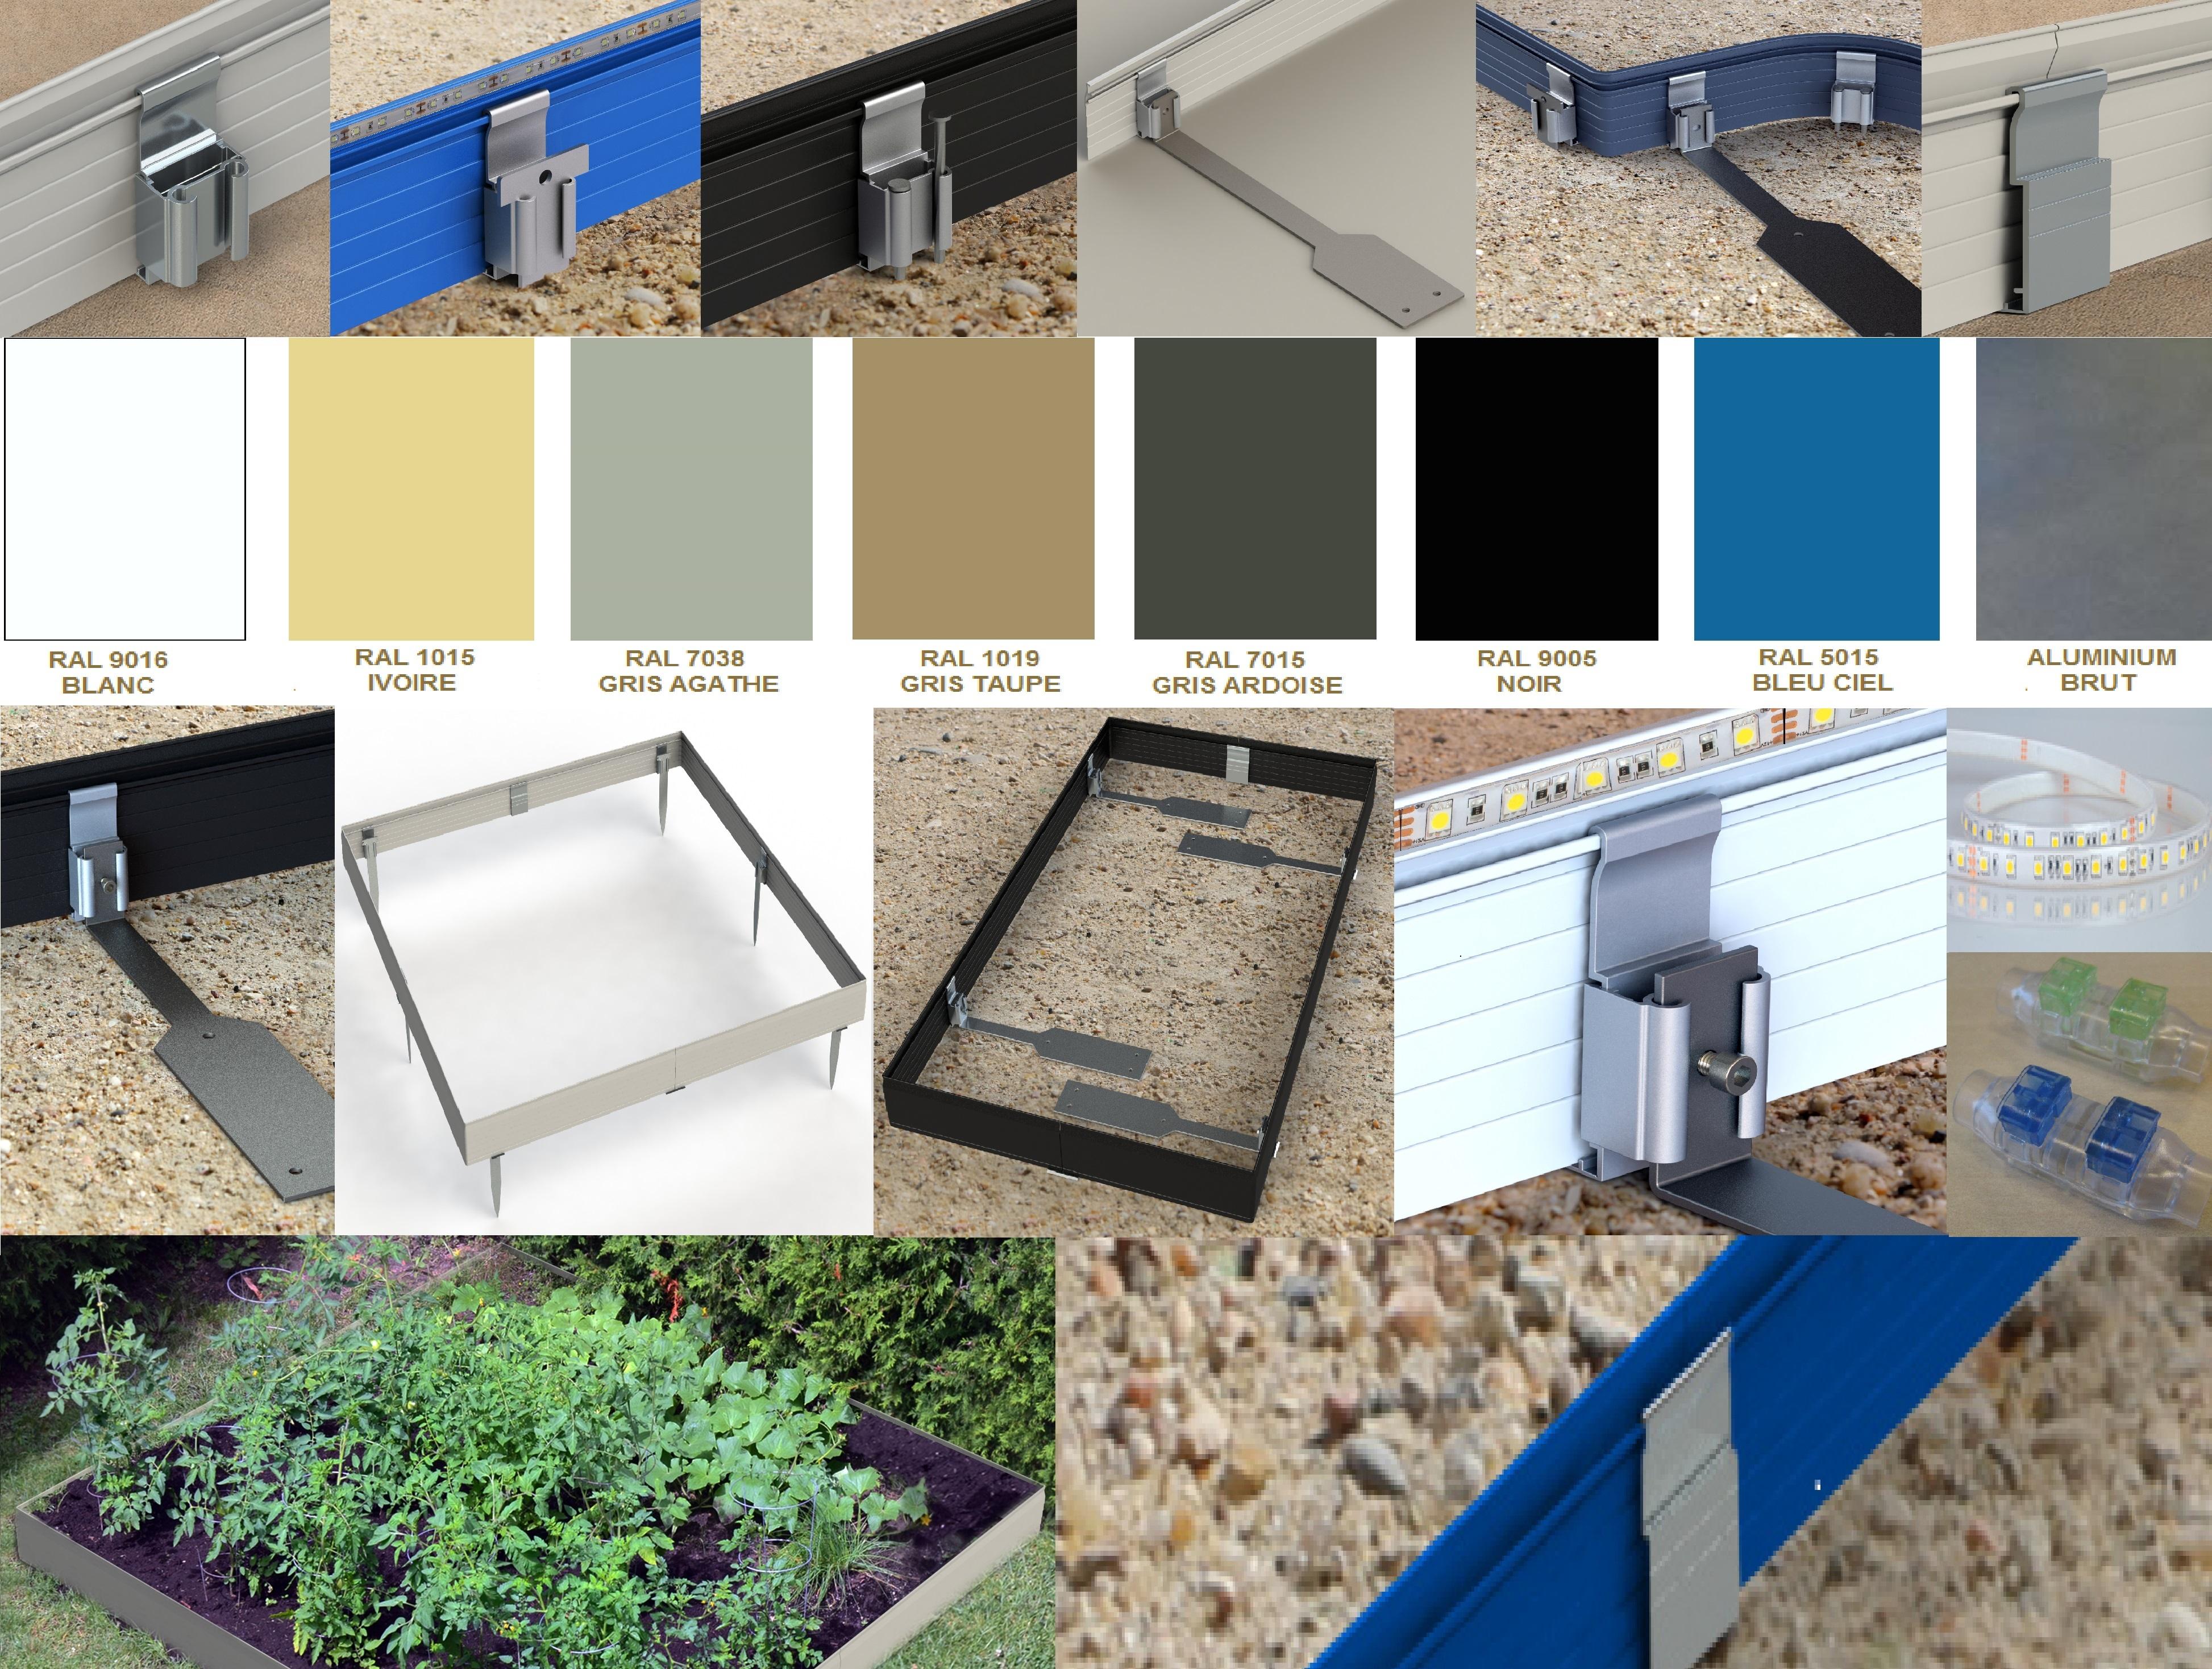 bordure aluminium pour jardin apanalu Apanages